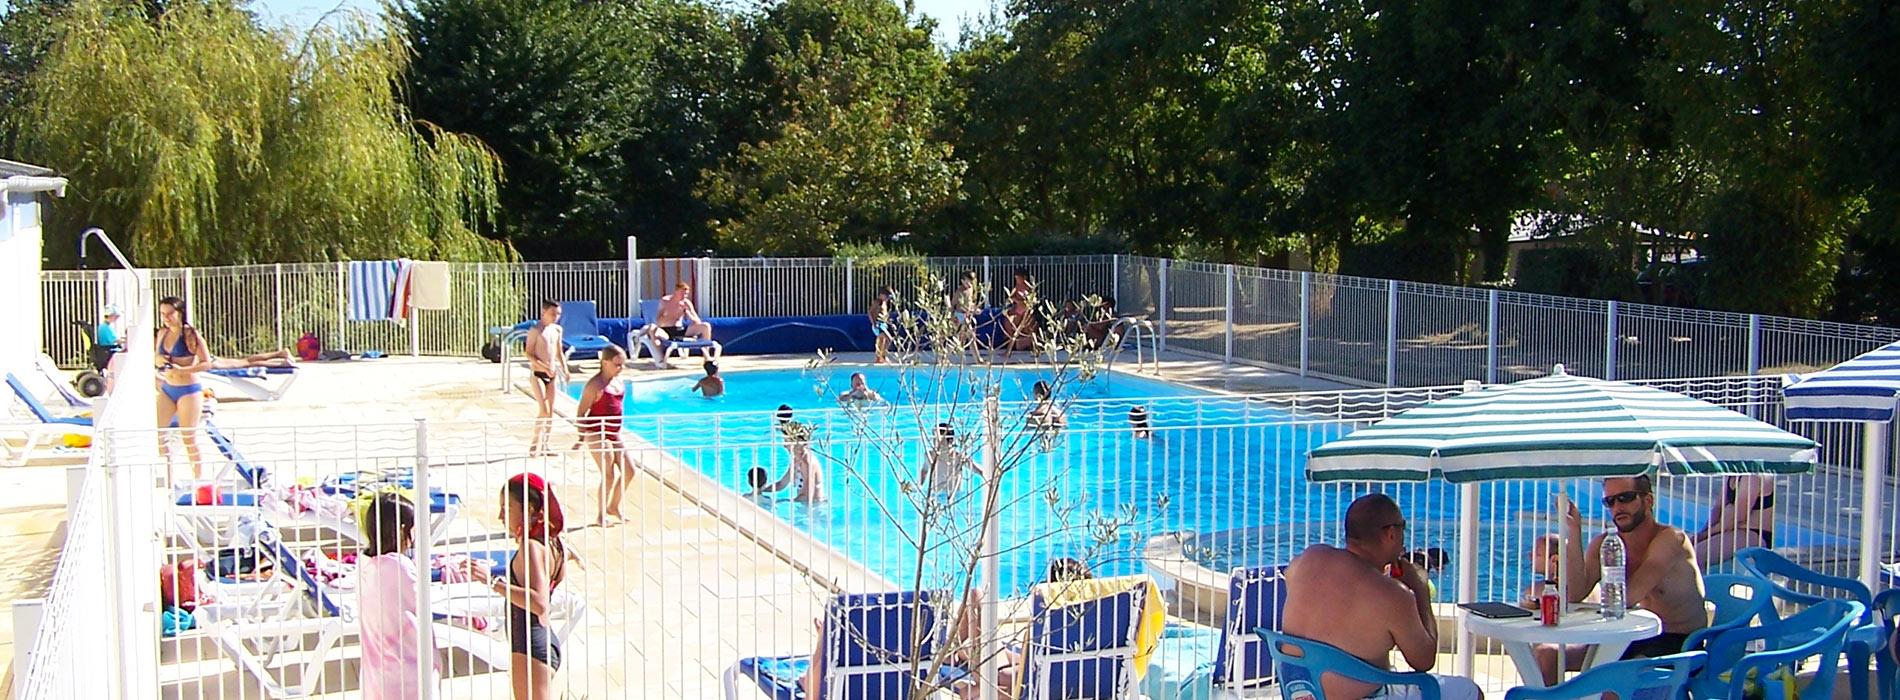 Camping de k rnejeune arzal morbihan bretagne sud for Camping piscine bretagne sud